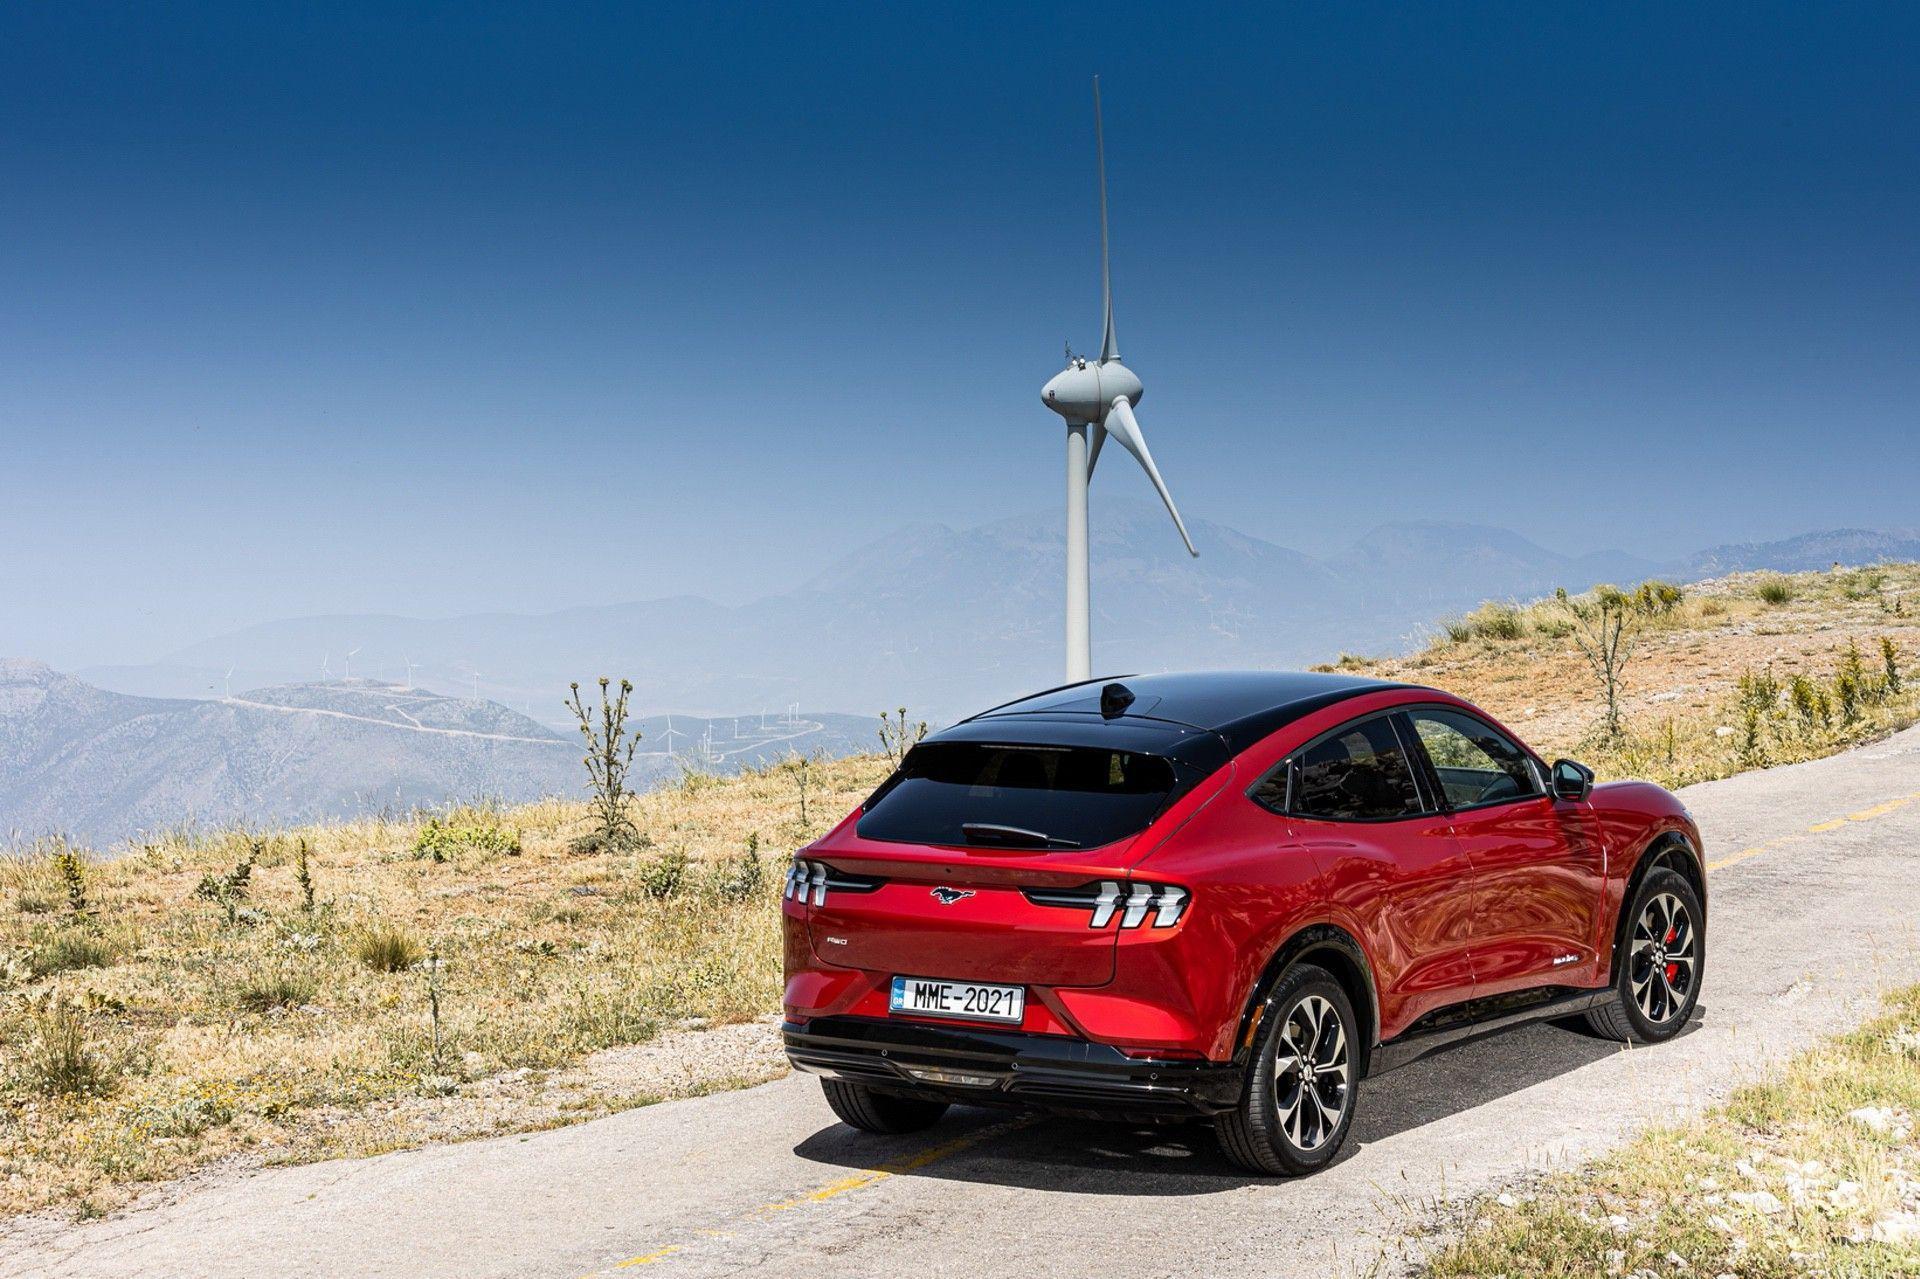 Ford_Mustang_Mach-E_greek_presskit-0048